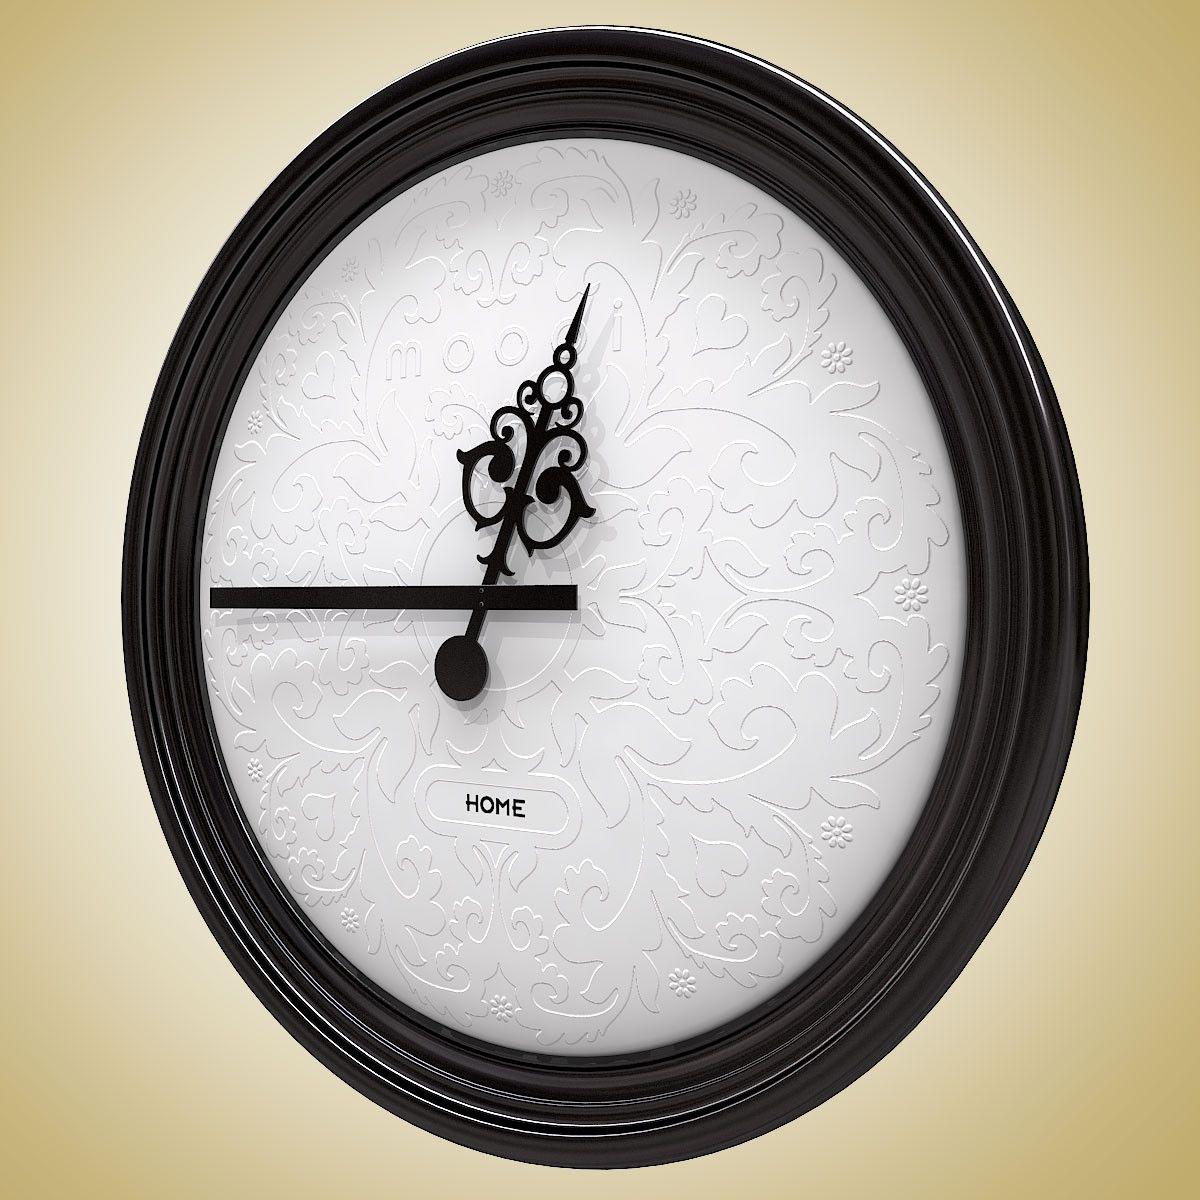 Moooi big ben wall clock httpbleeckerstreetbeat moooi big ben wall clock jeuxipadfo Images